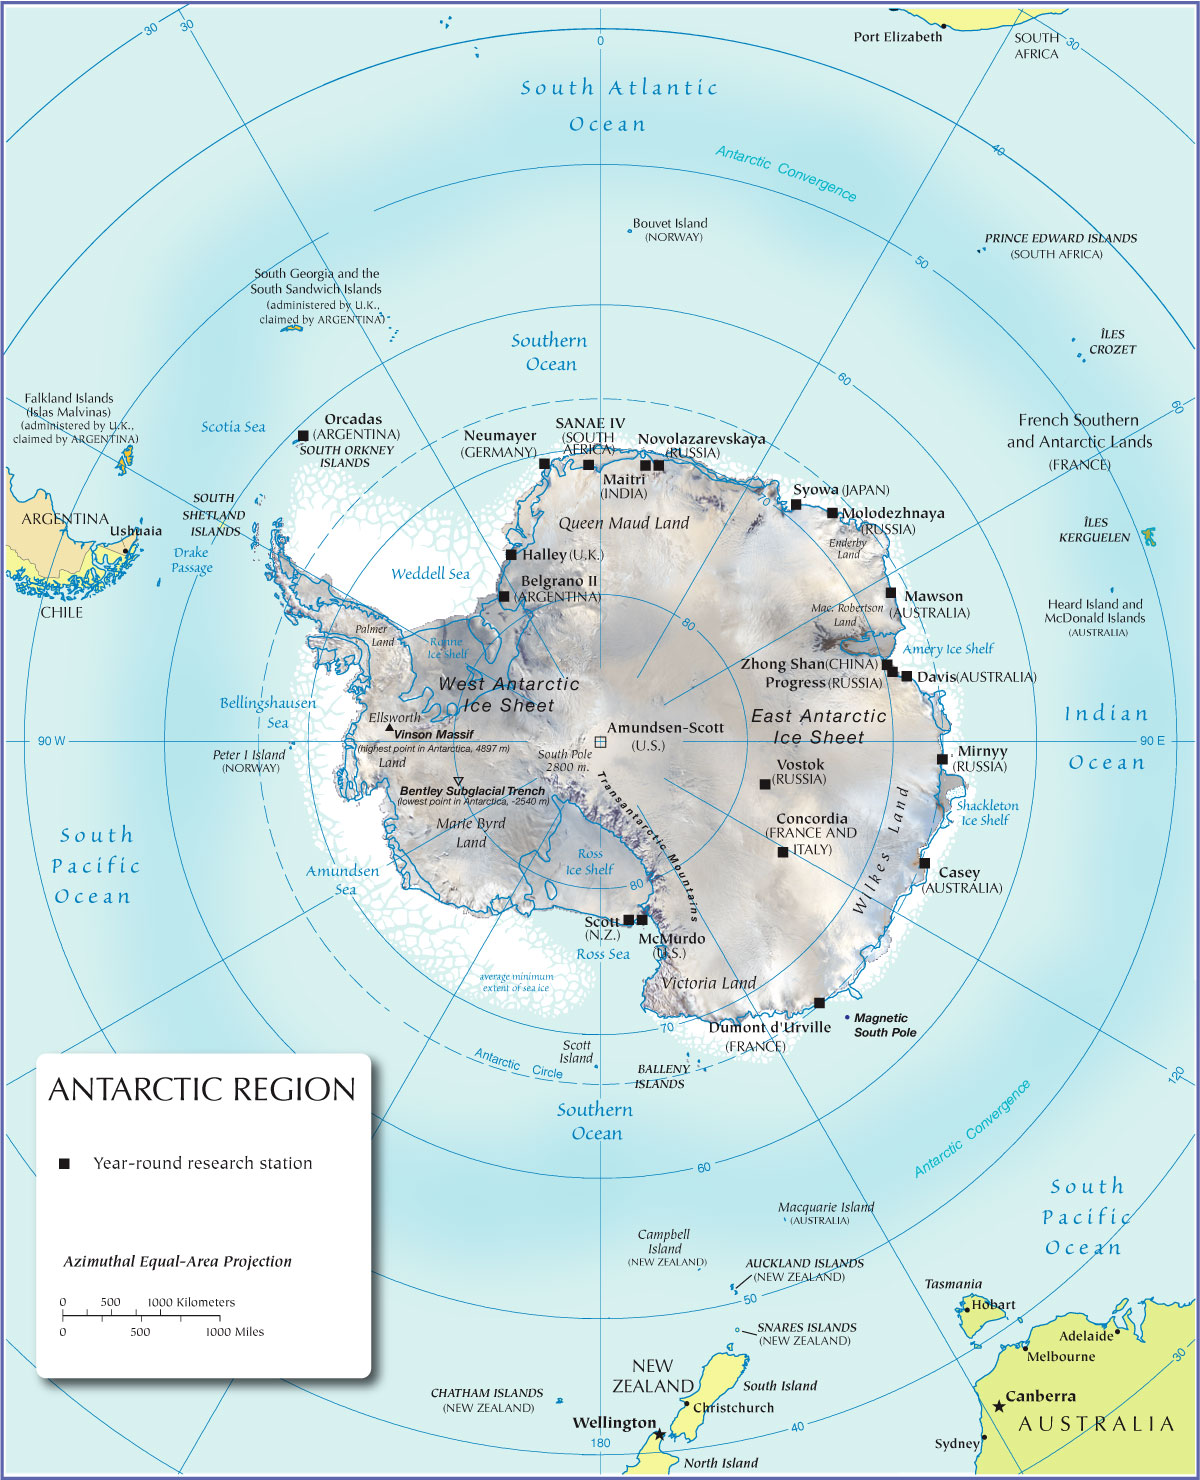 Map of the Antarctic region